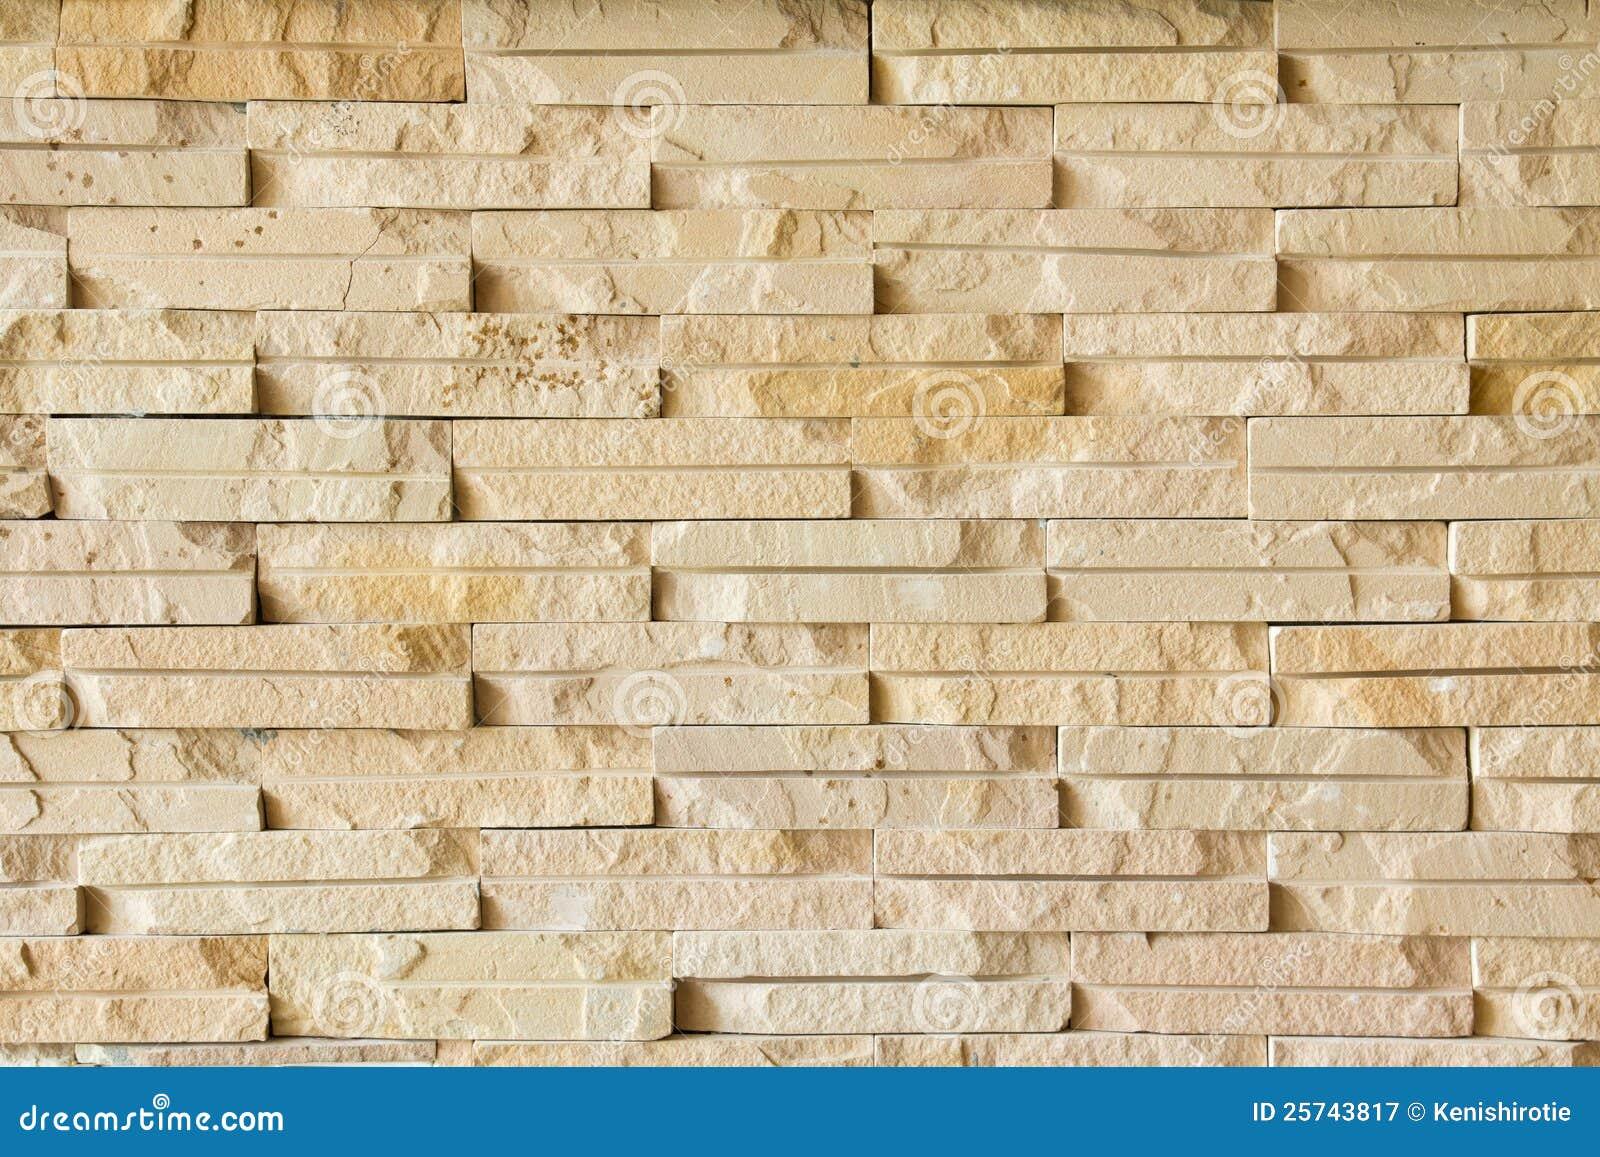 Stone wall background horizontal